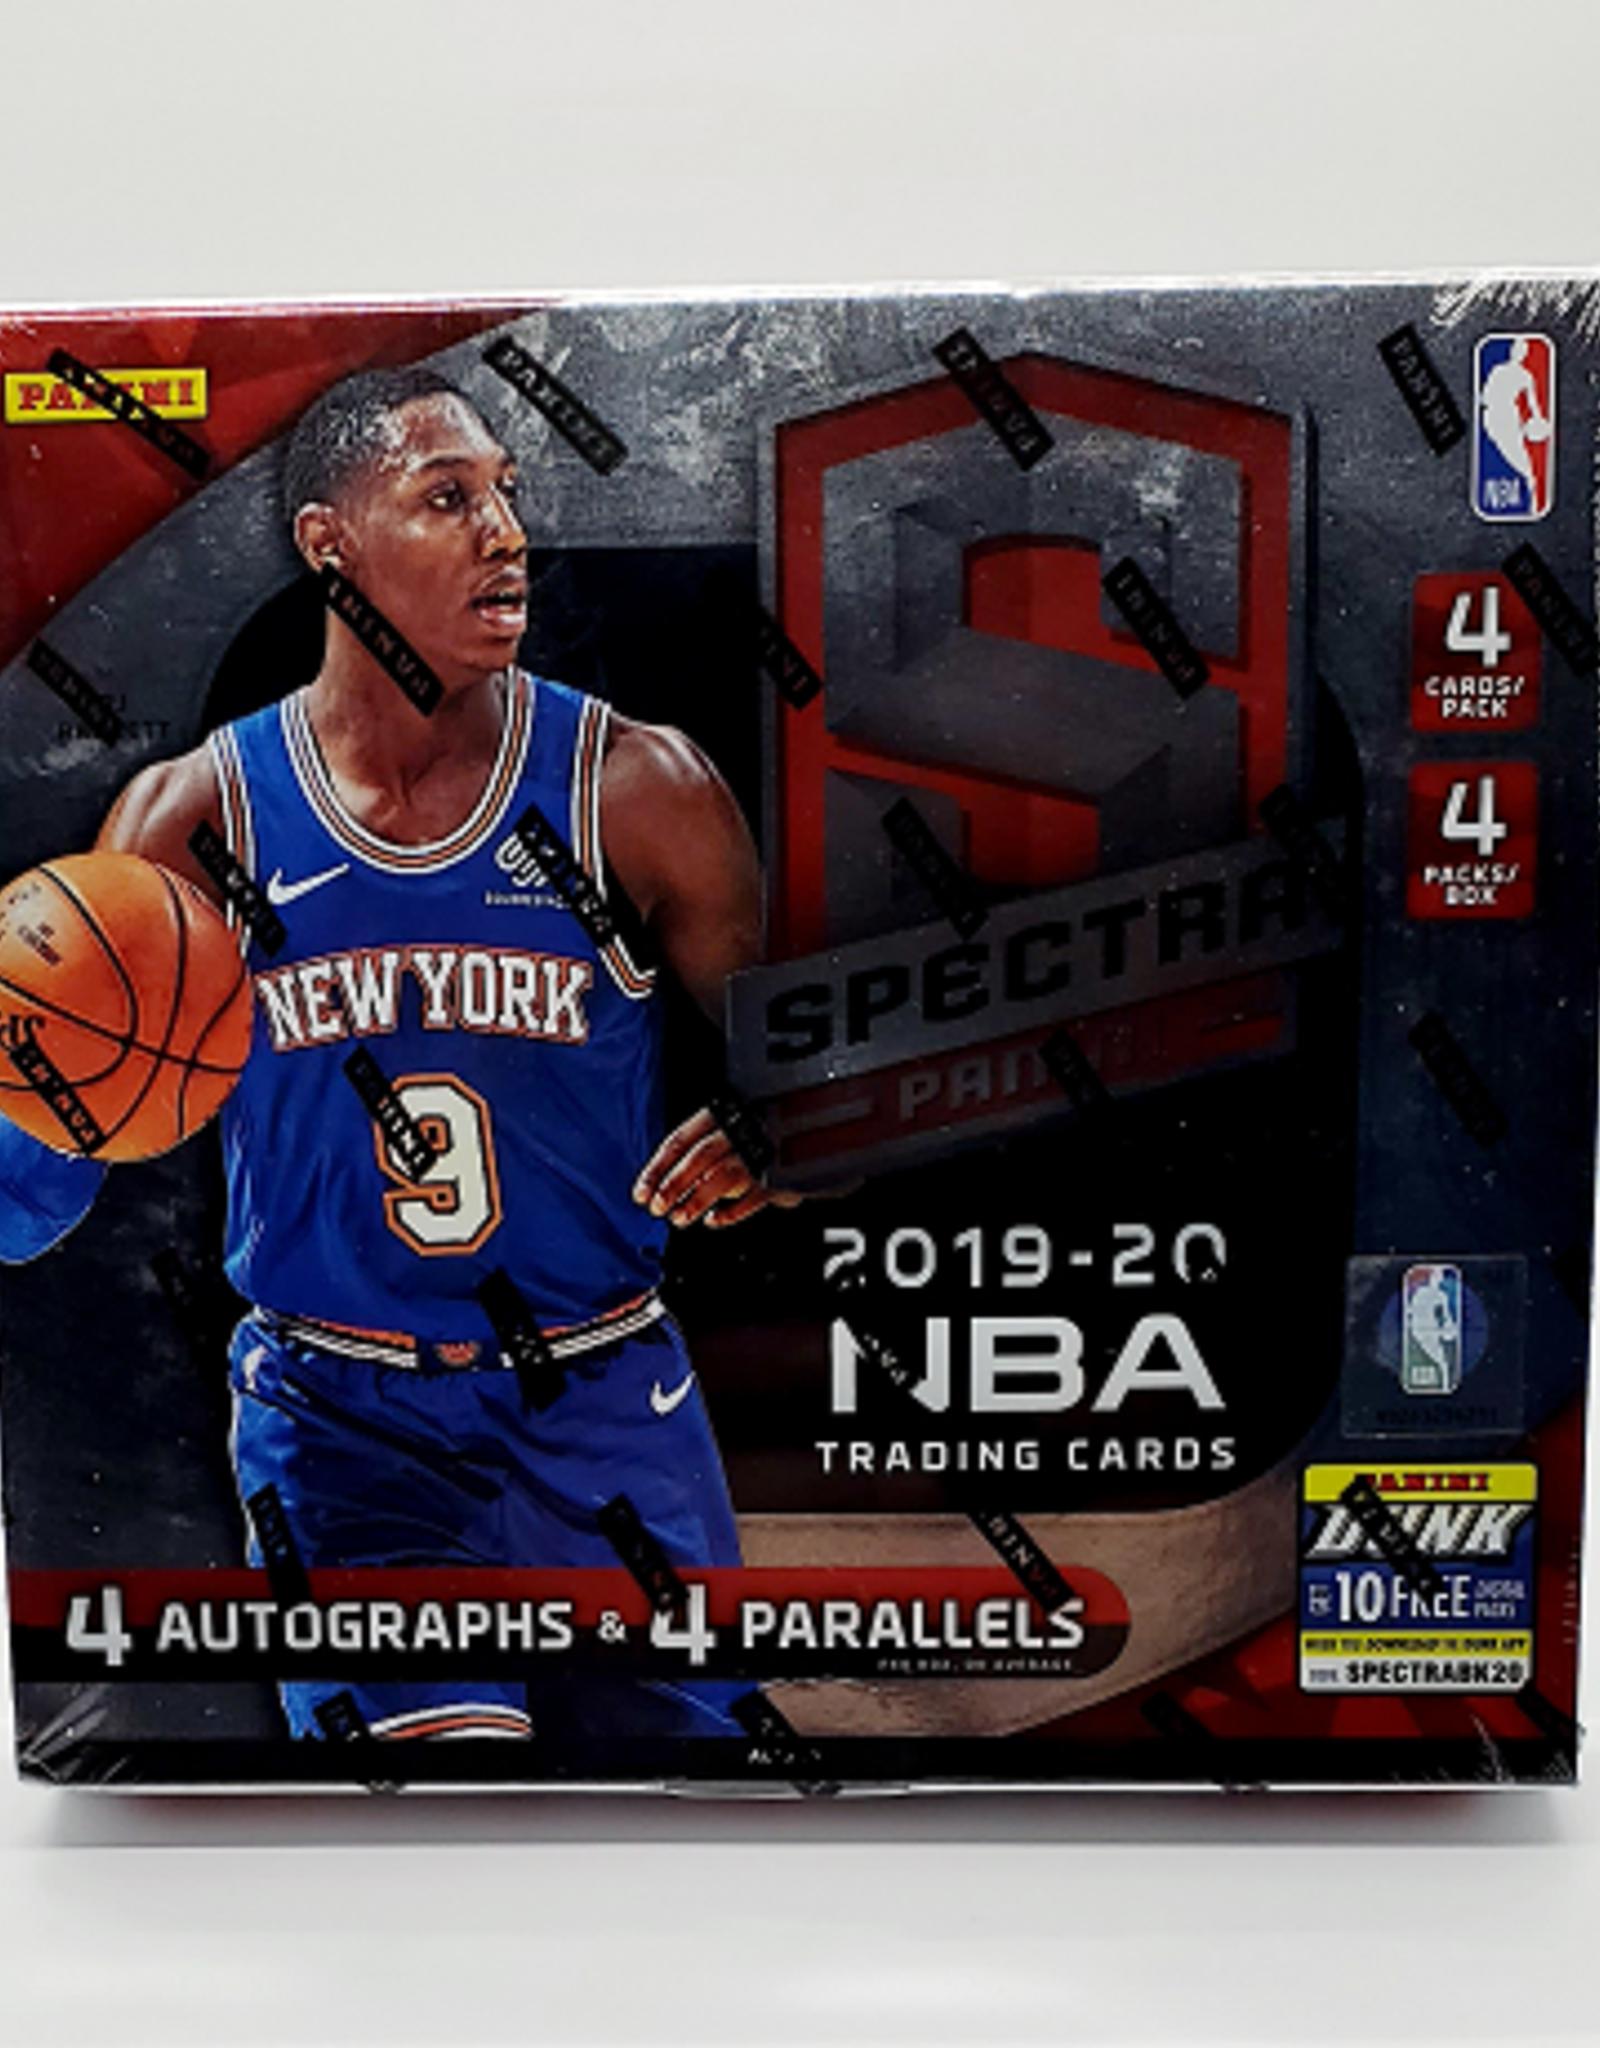 Panini America 2019-20 Panini Spectra Basketball Hobby Box